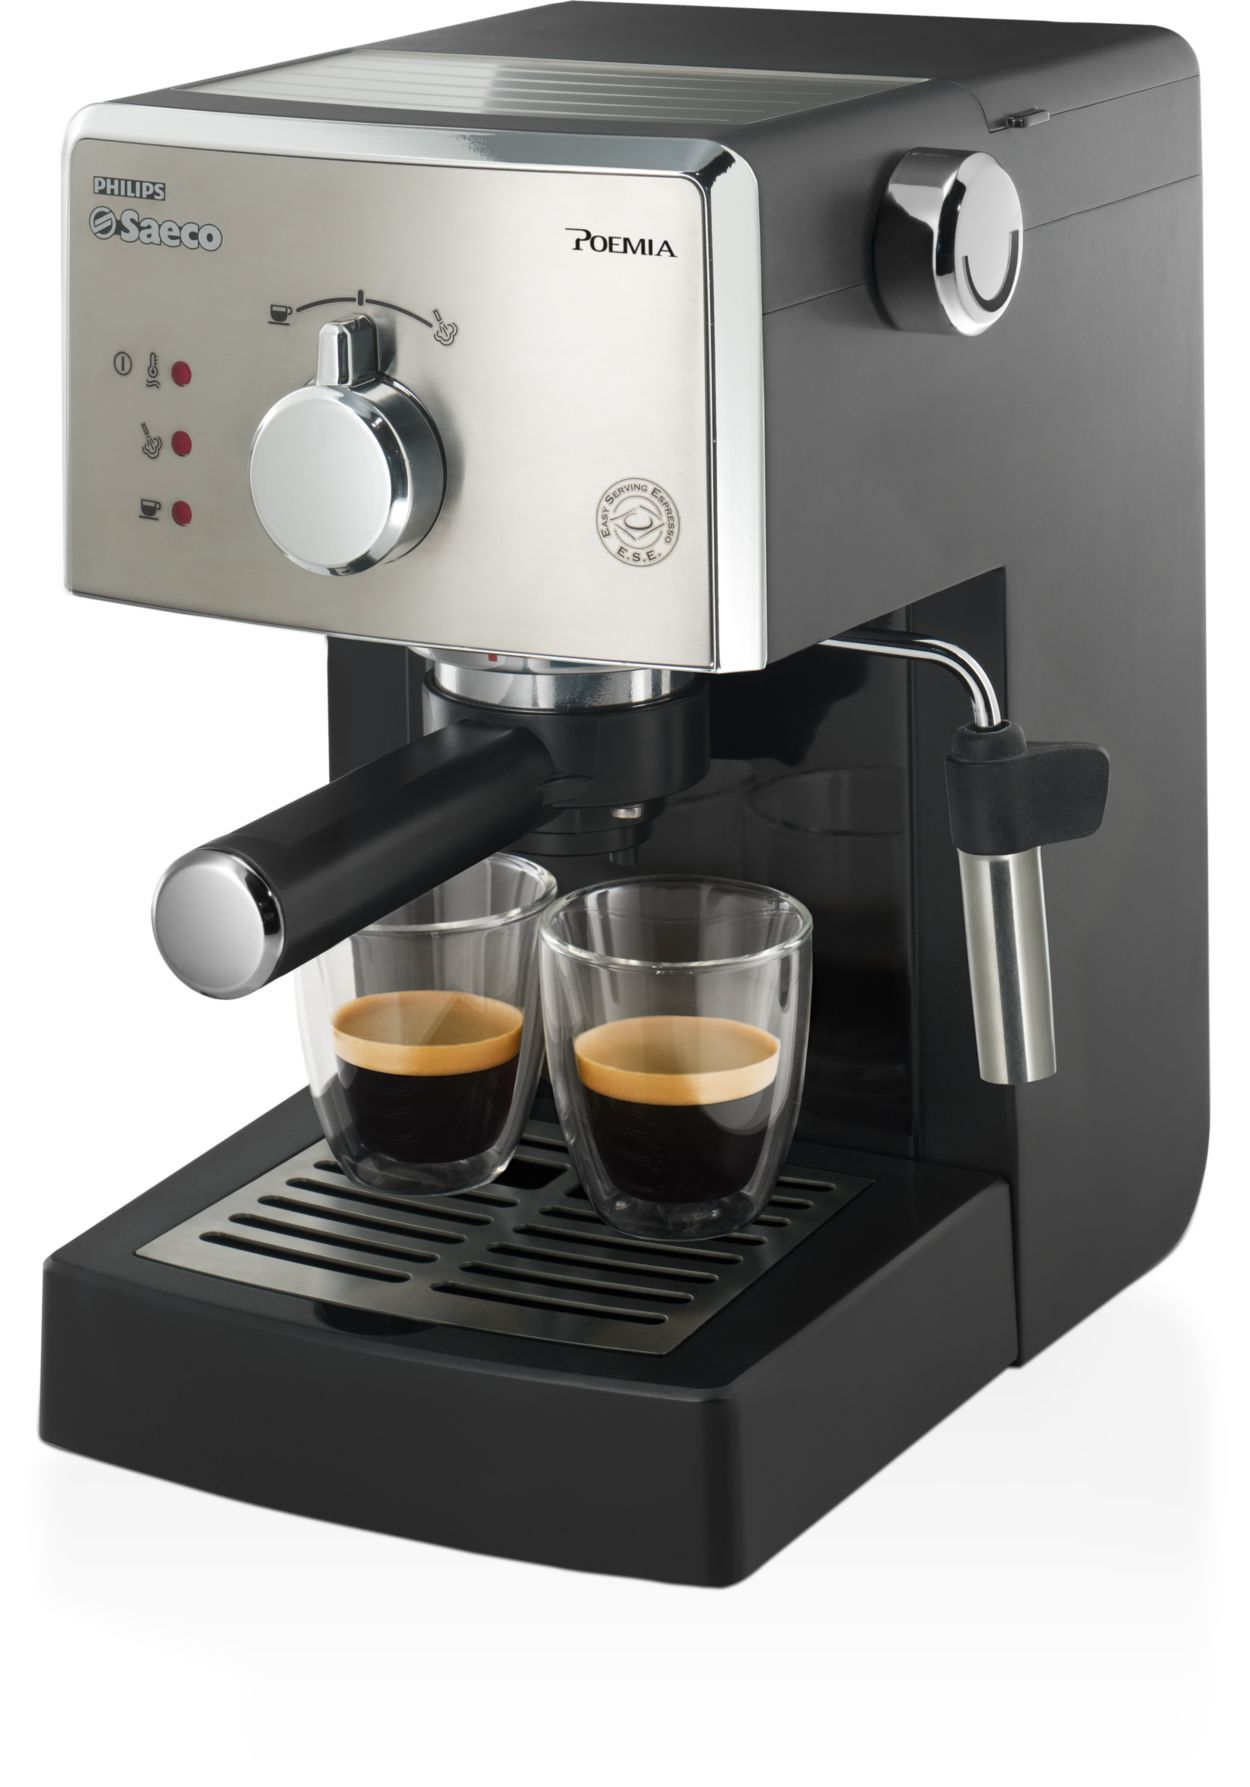 Electronic Saeco Coffee Machine Manual poemia manual espresso machine hd832501 saeco authentic italian every day